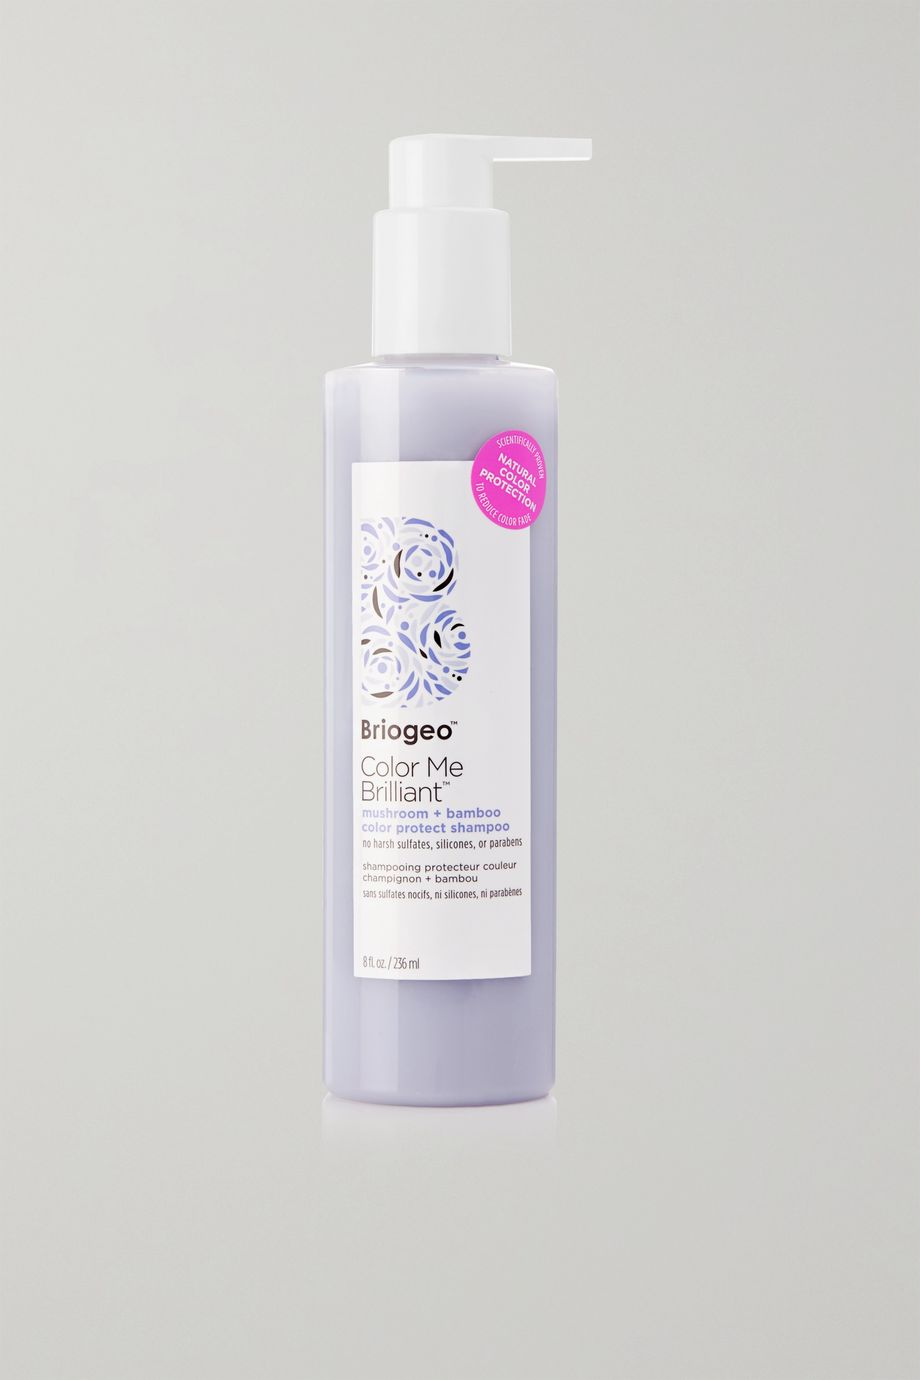 Briogeo Color Me Brilliant Mushroom + Bamboo Color Protect Shampoo, 236ml